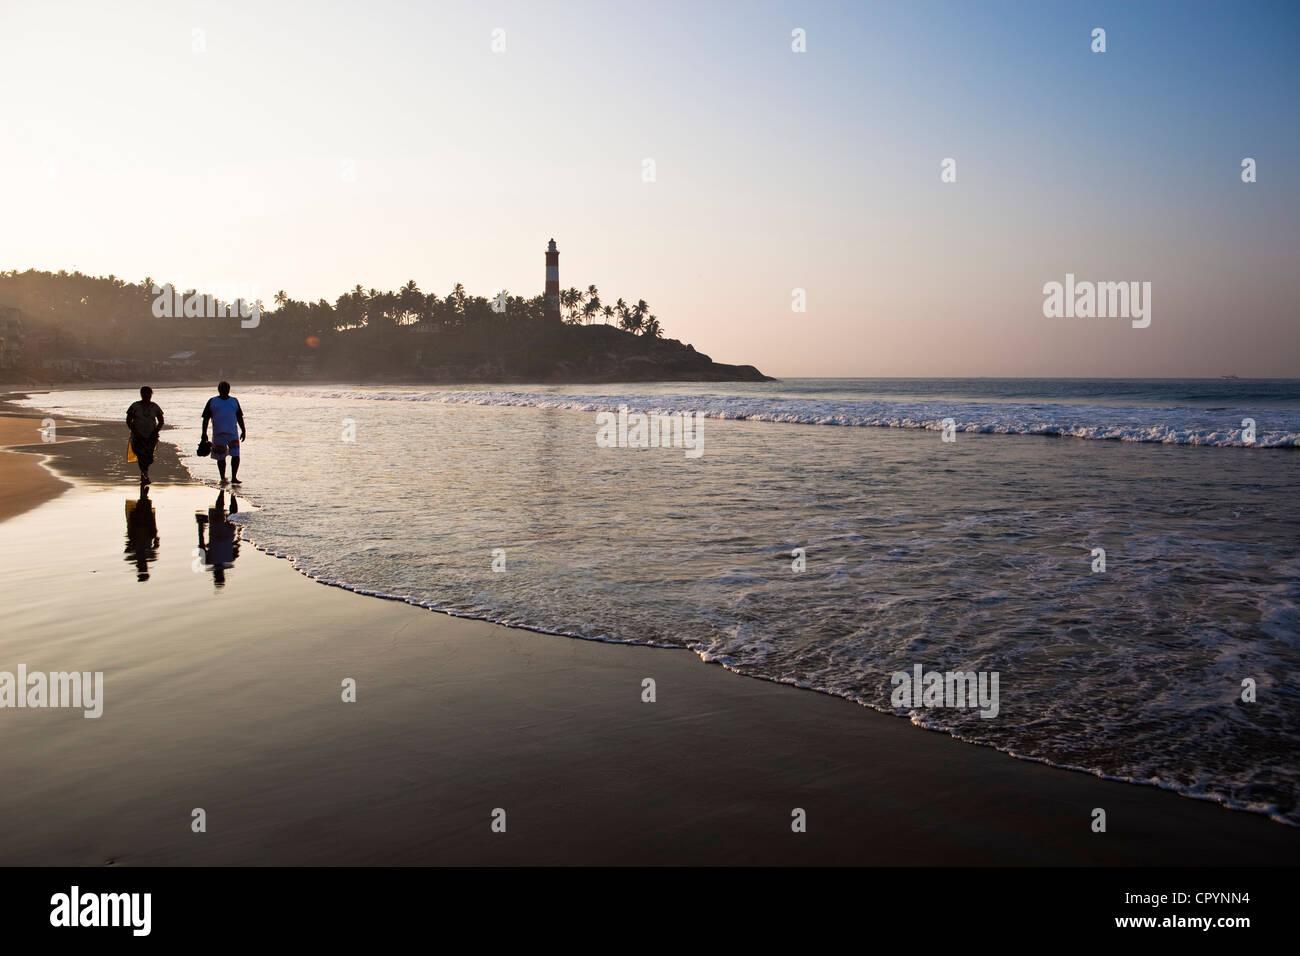 India, Kerala State, seaside resort of Kovalam, the beach - Stock Image